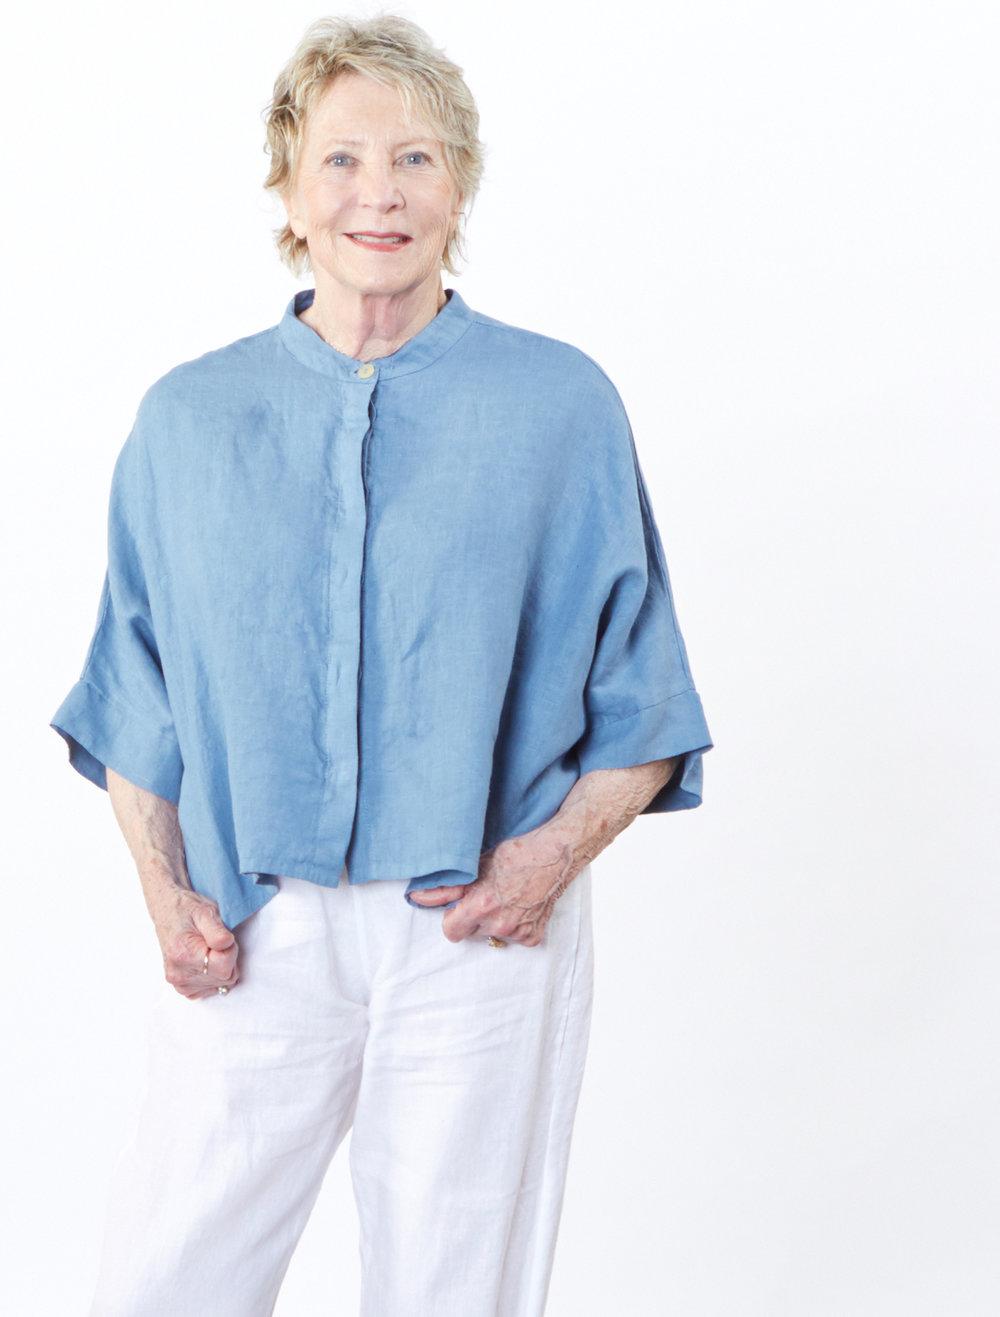 Joe Shirt in Geyser, Flat Front Pant in White Light Linen